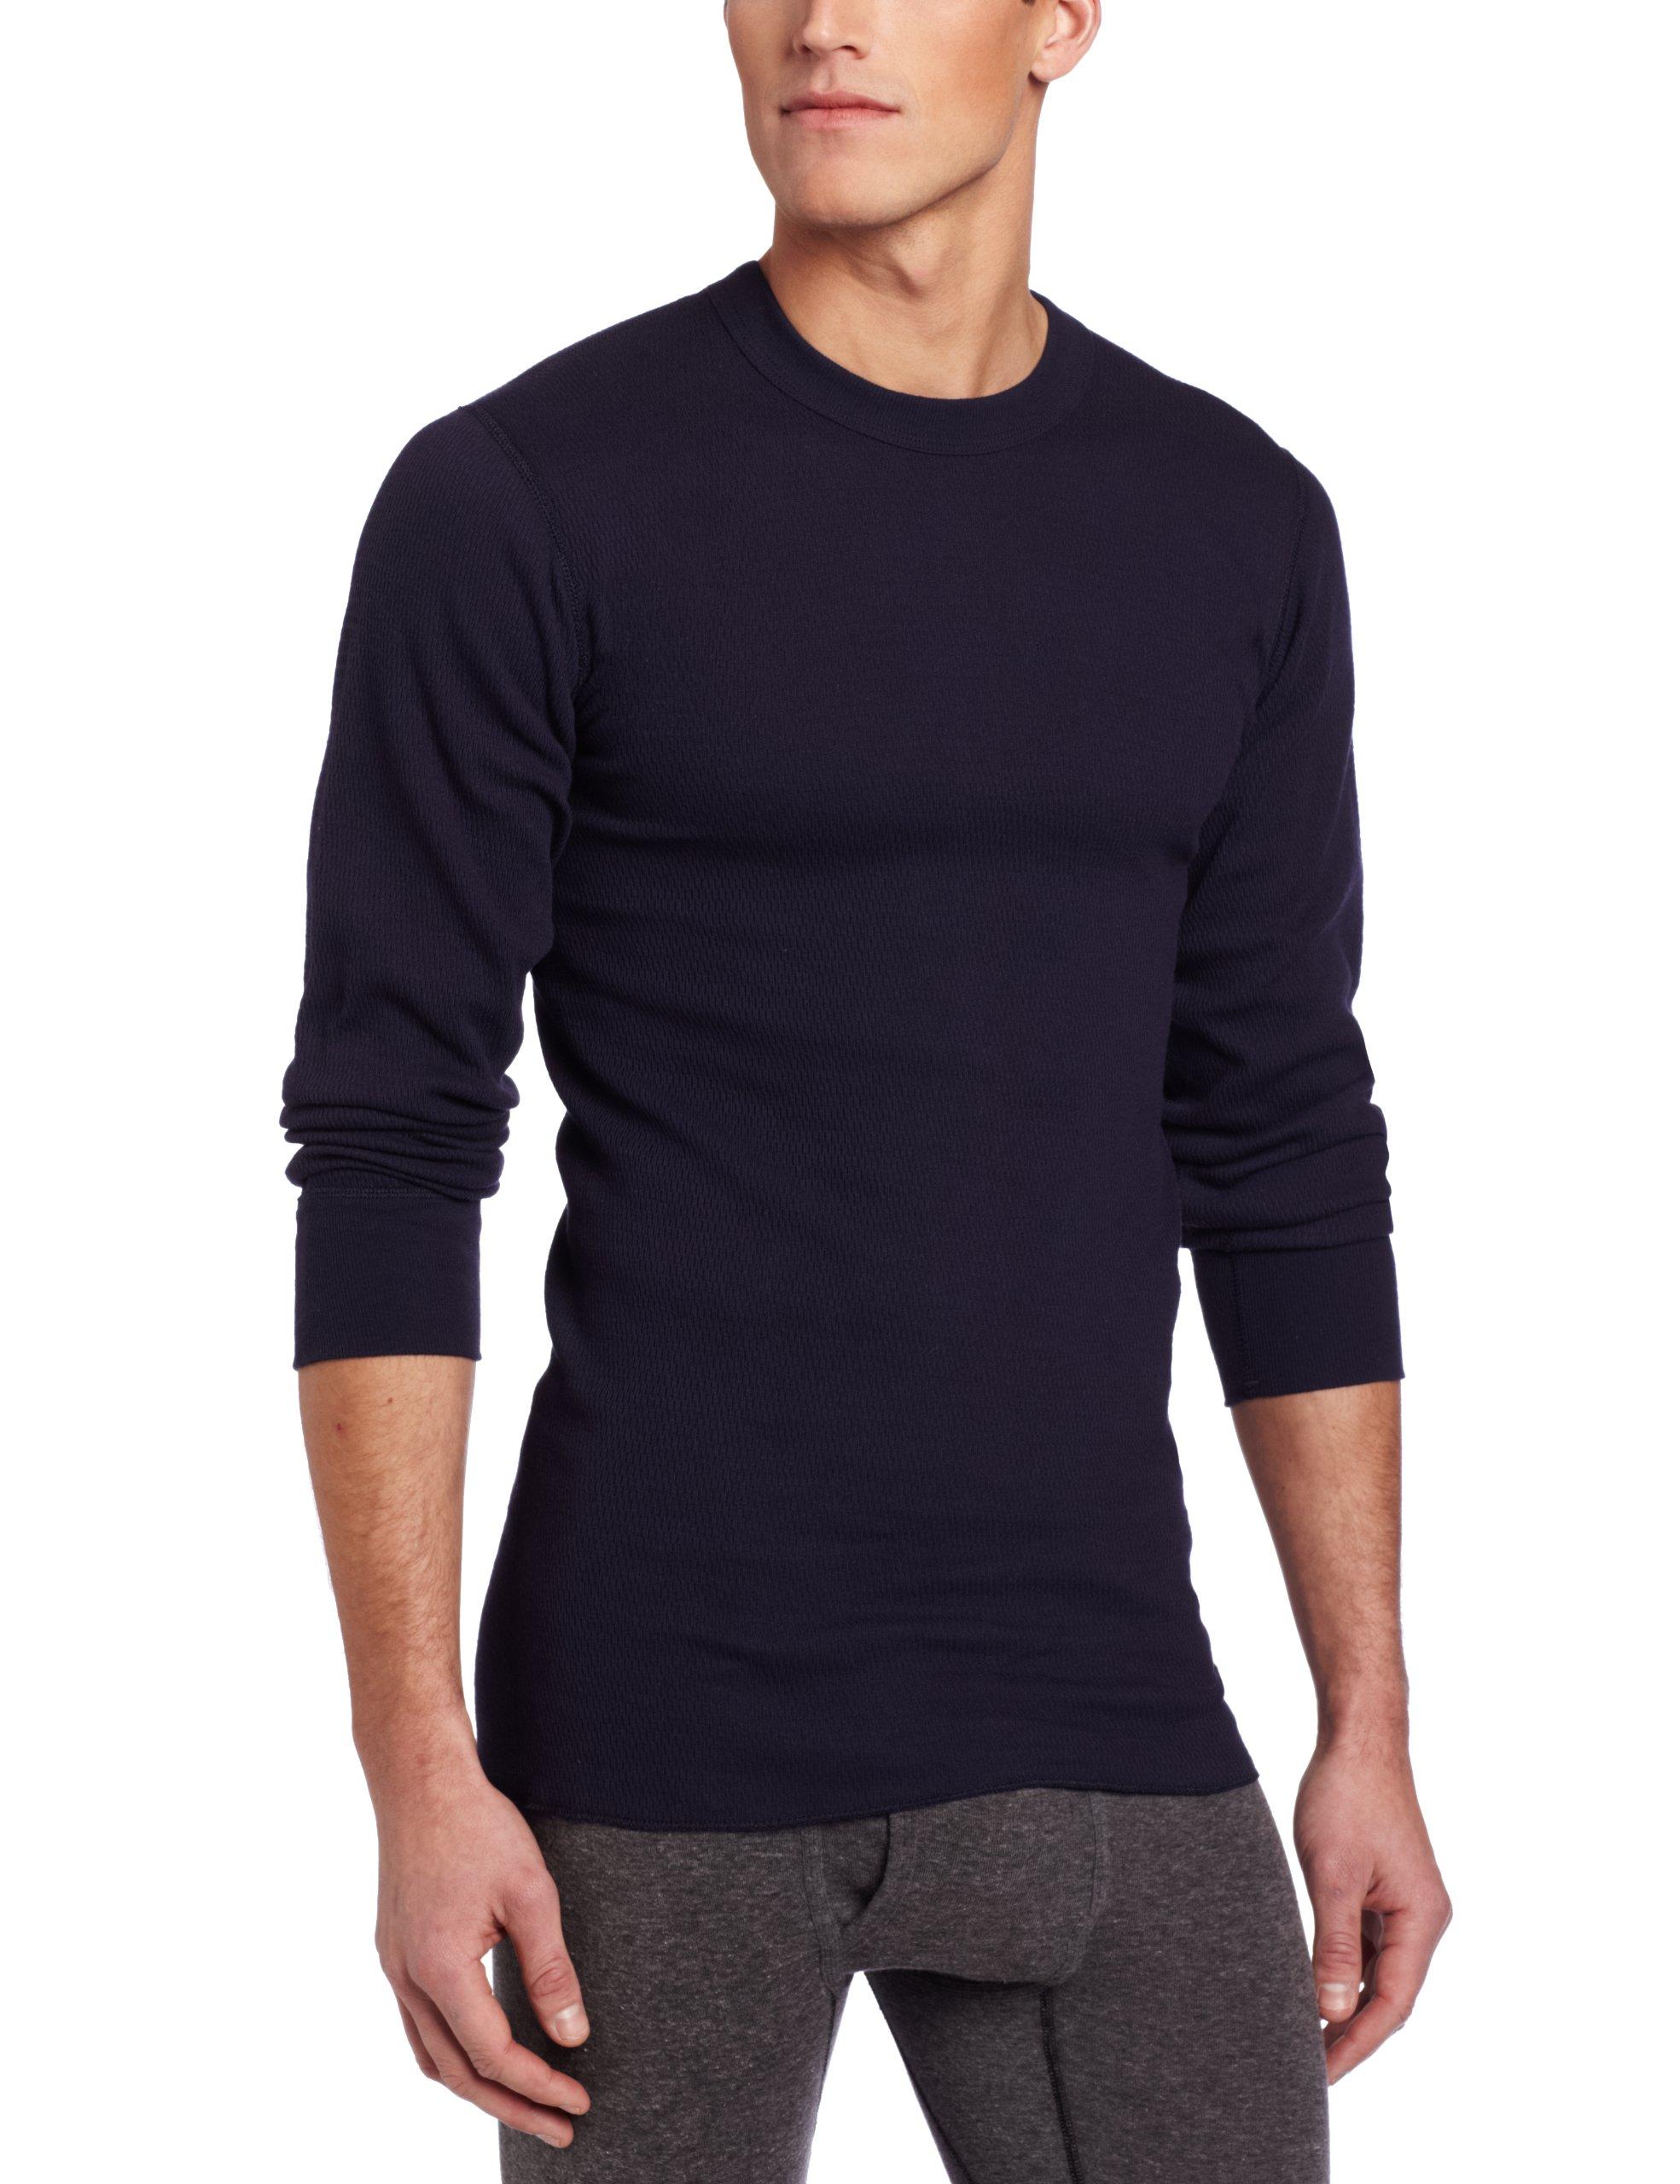 Rock Face Men's Tall 7 oz Lightweight Knit Thermal Shirt, Navy, Medium